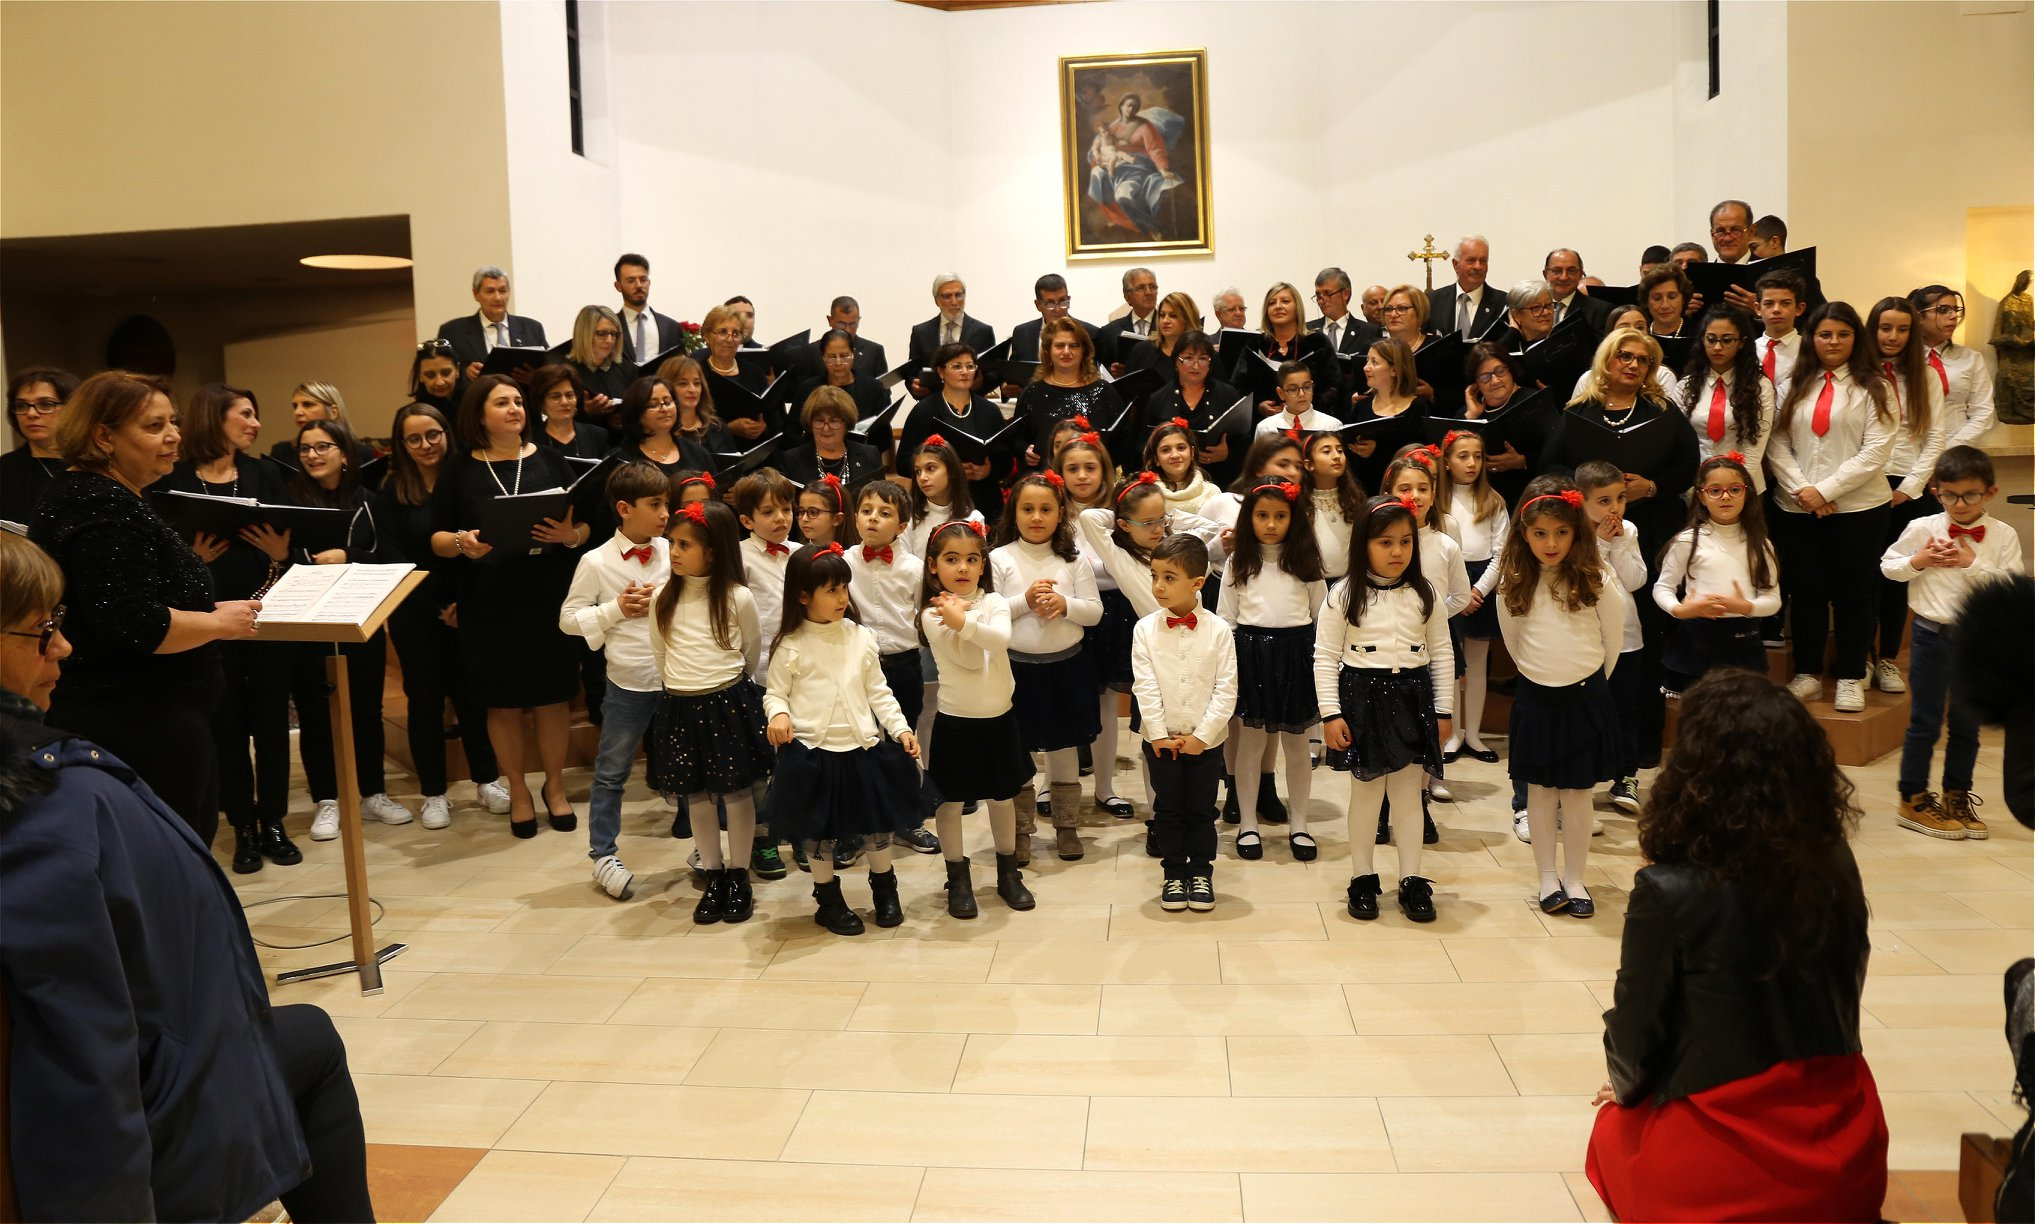 Concerta Natale 2019